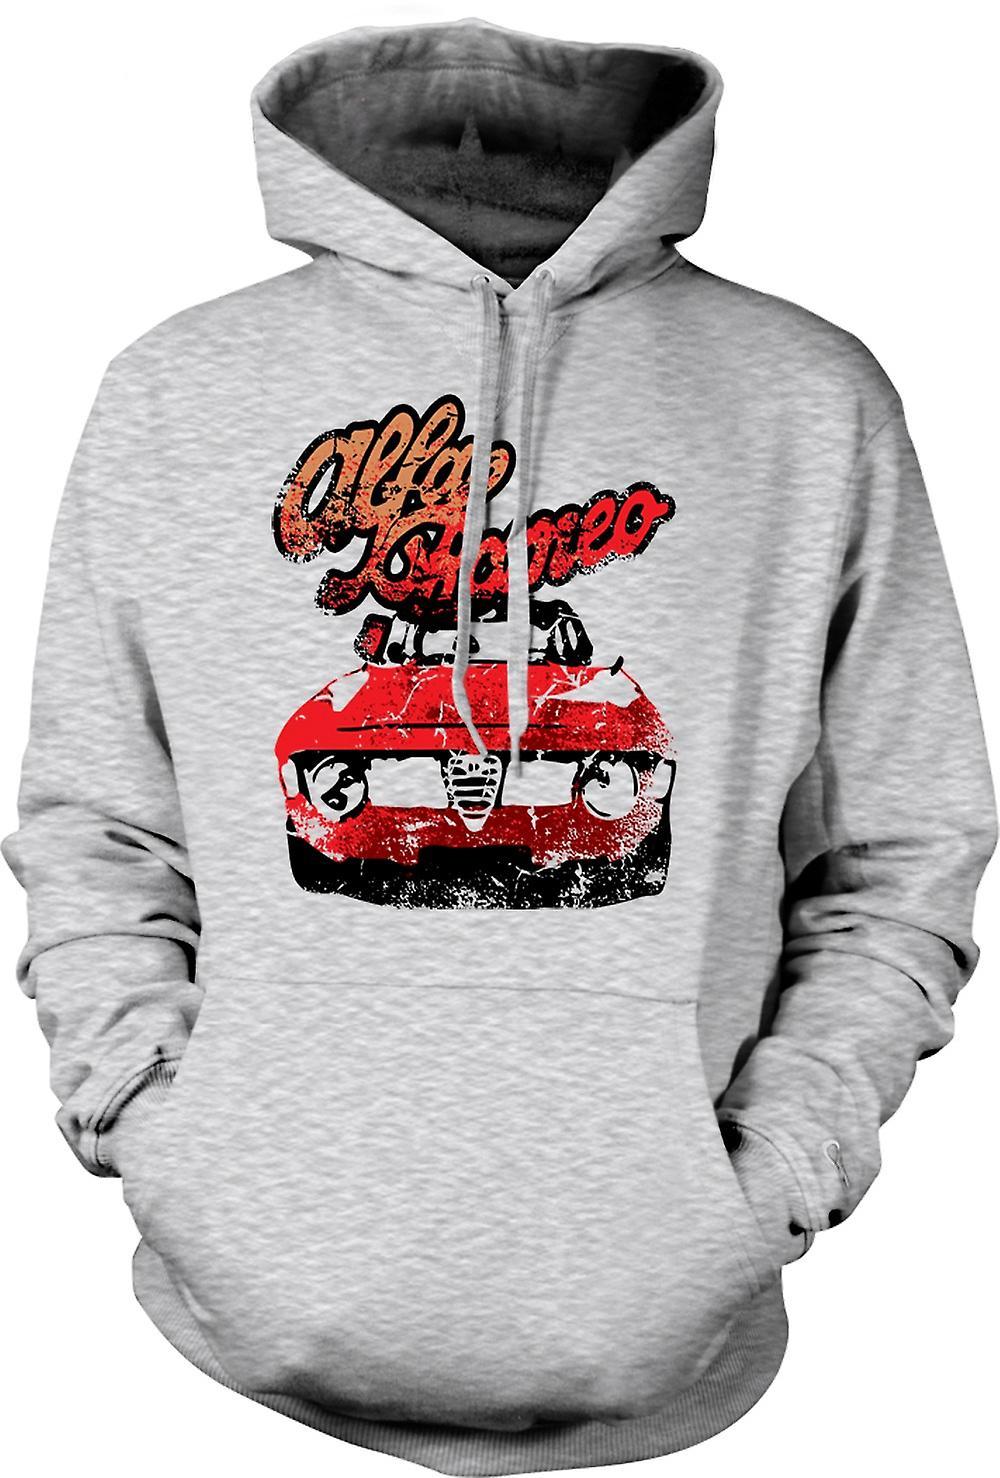 Mens Hoodie - Alfa Romeo Auto d'epoca